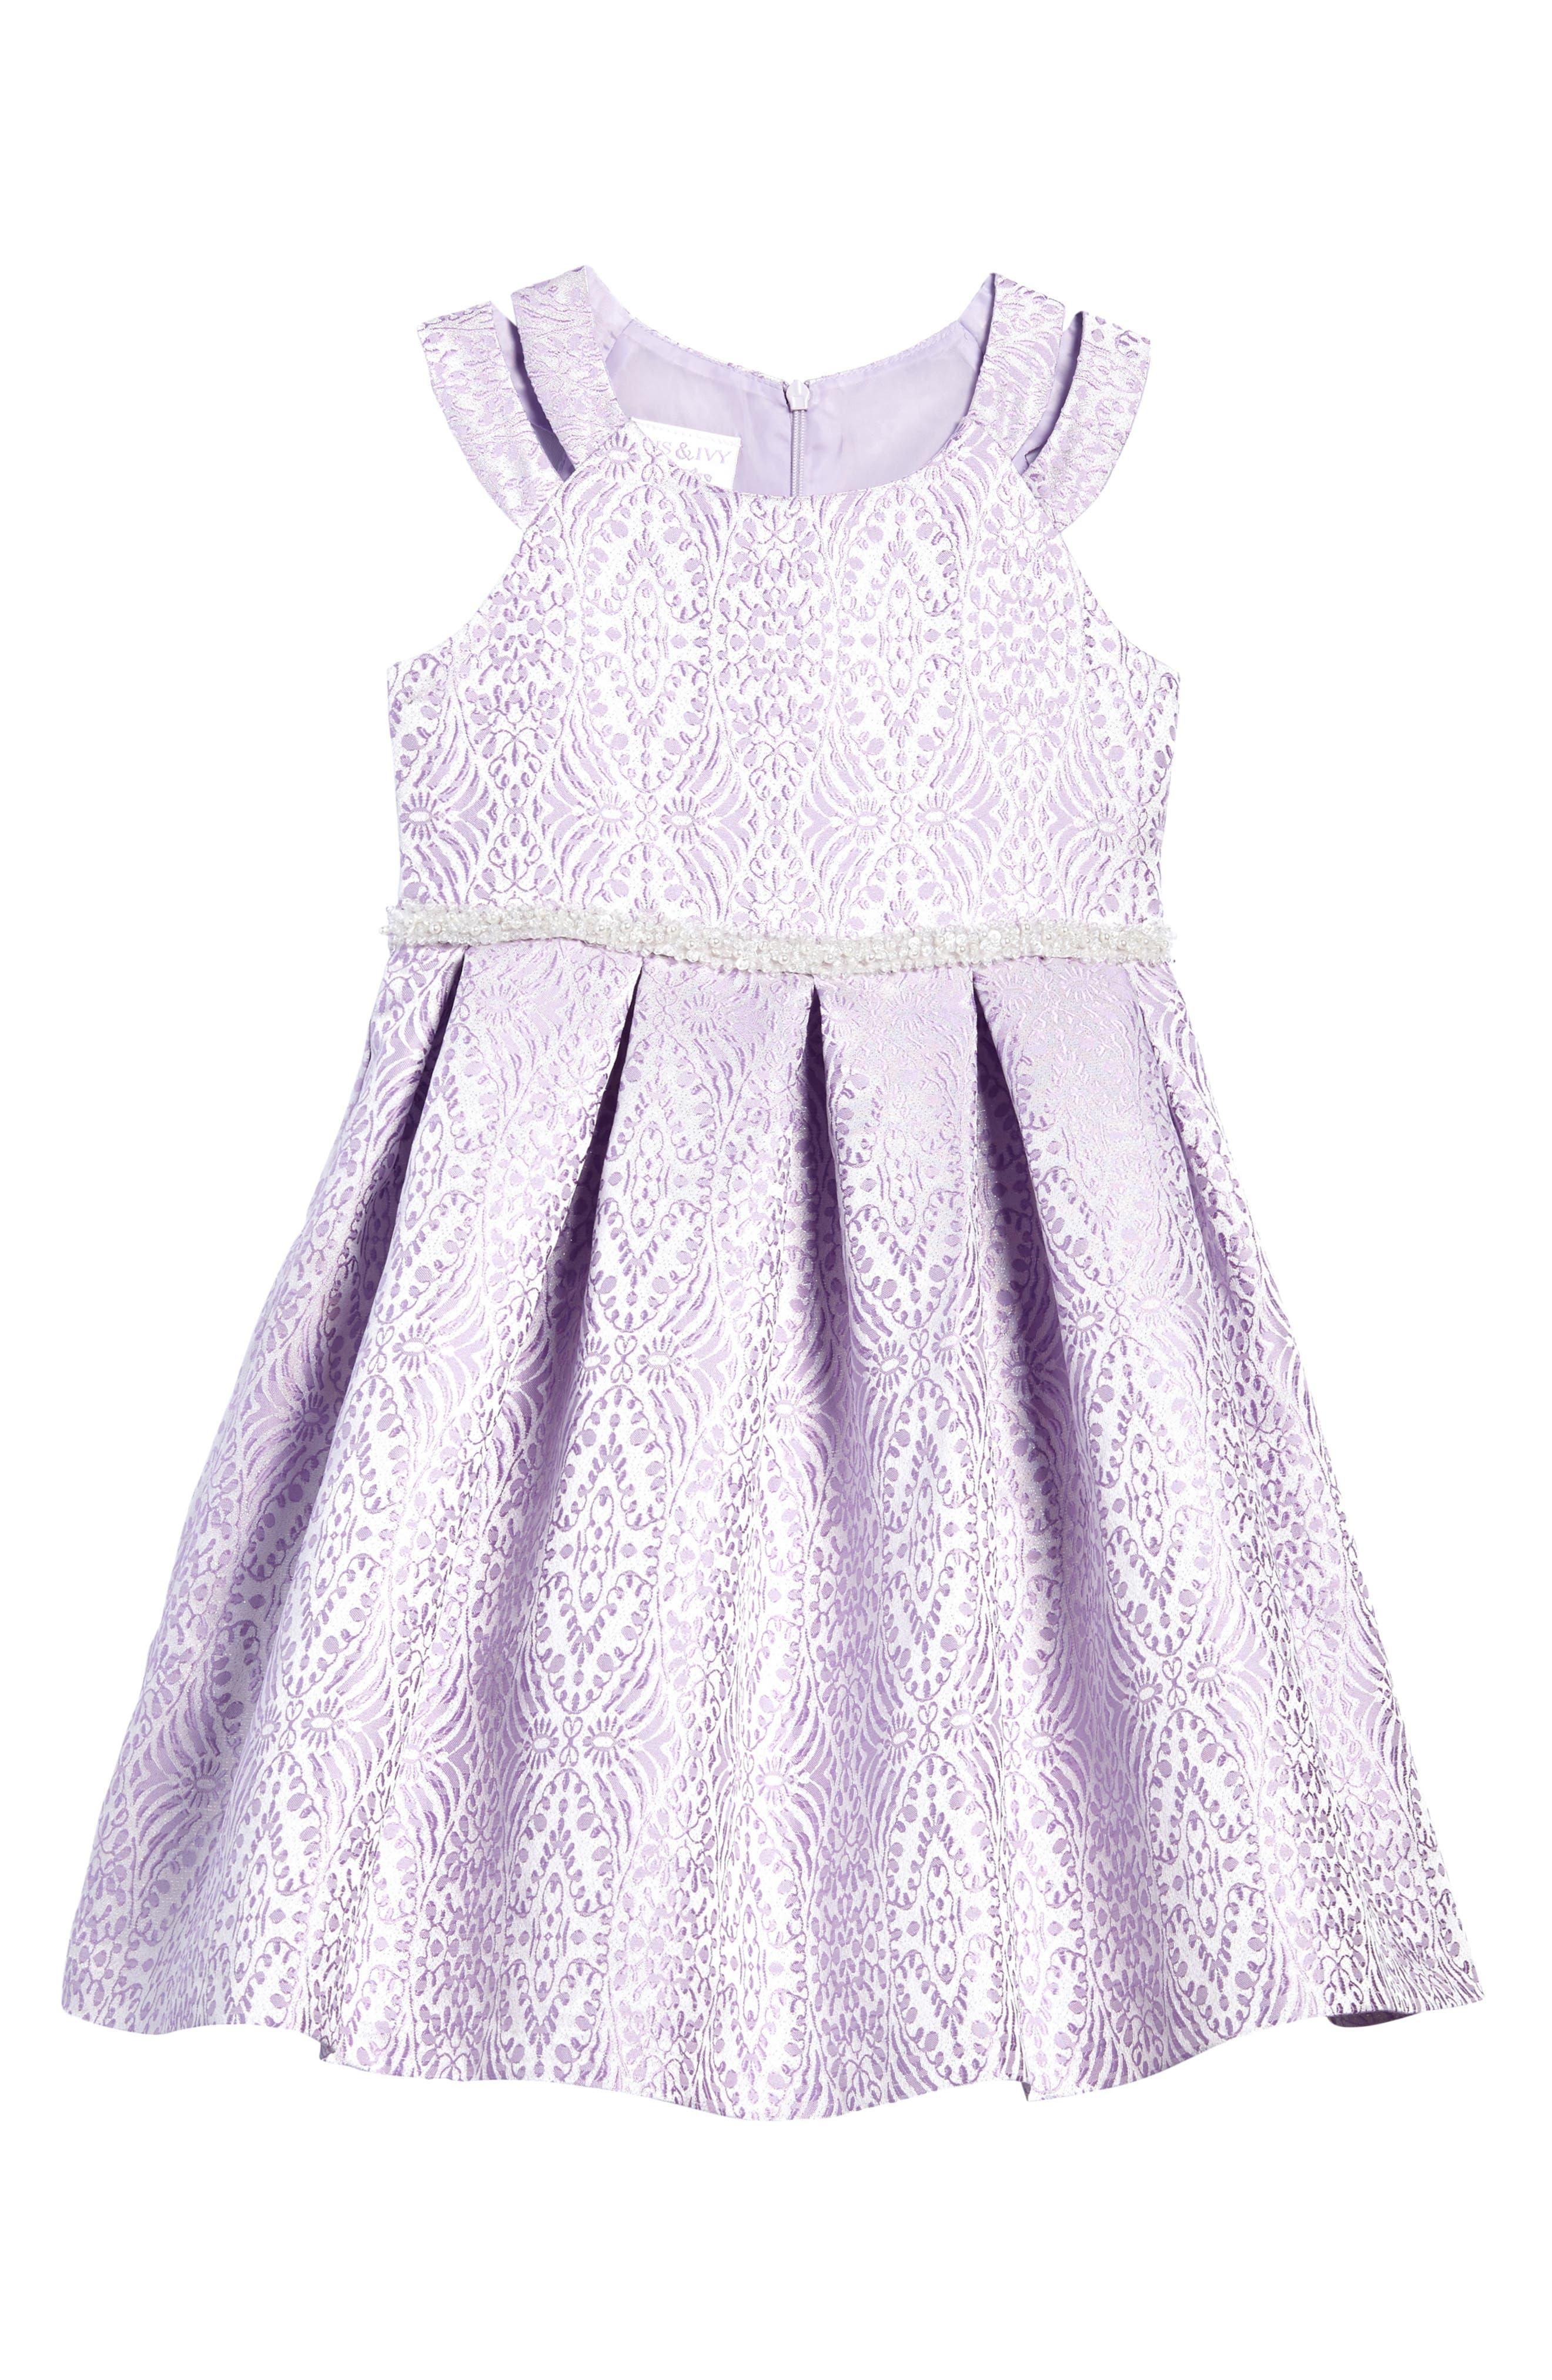 Jacquard Fit & Flare Dress,                         Main,                         color, 530